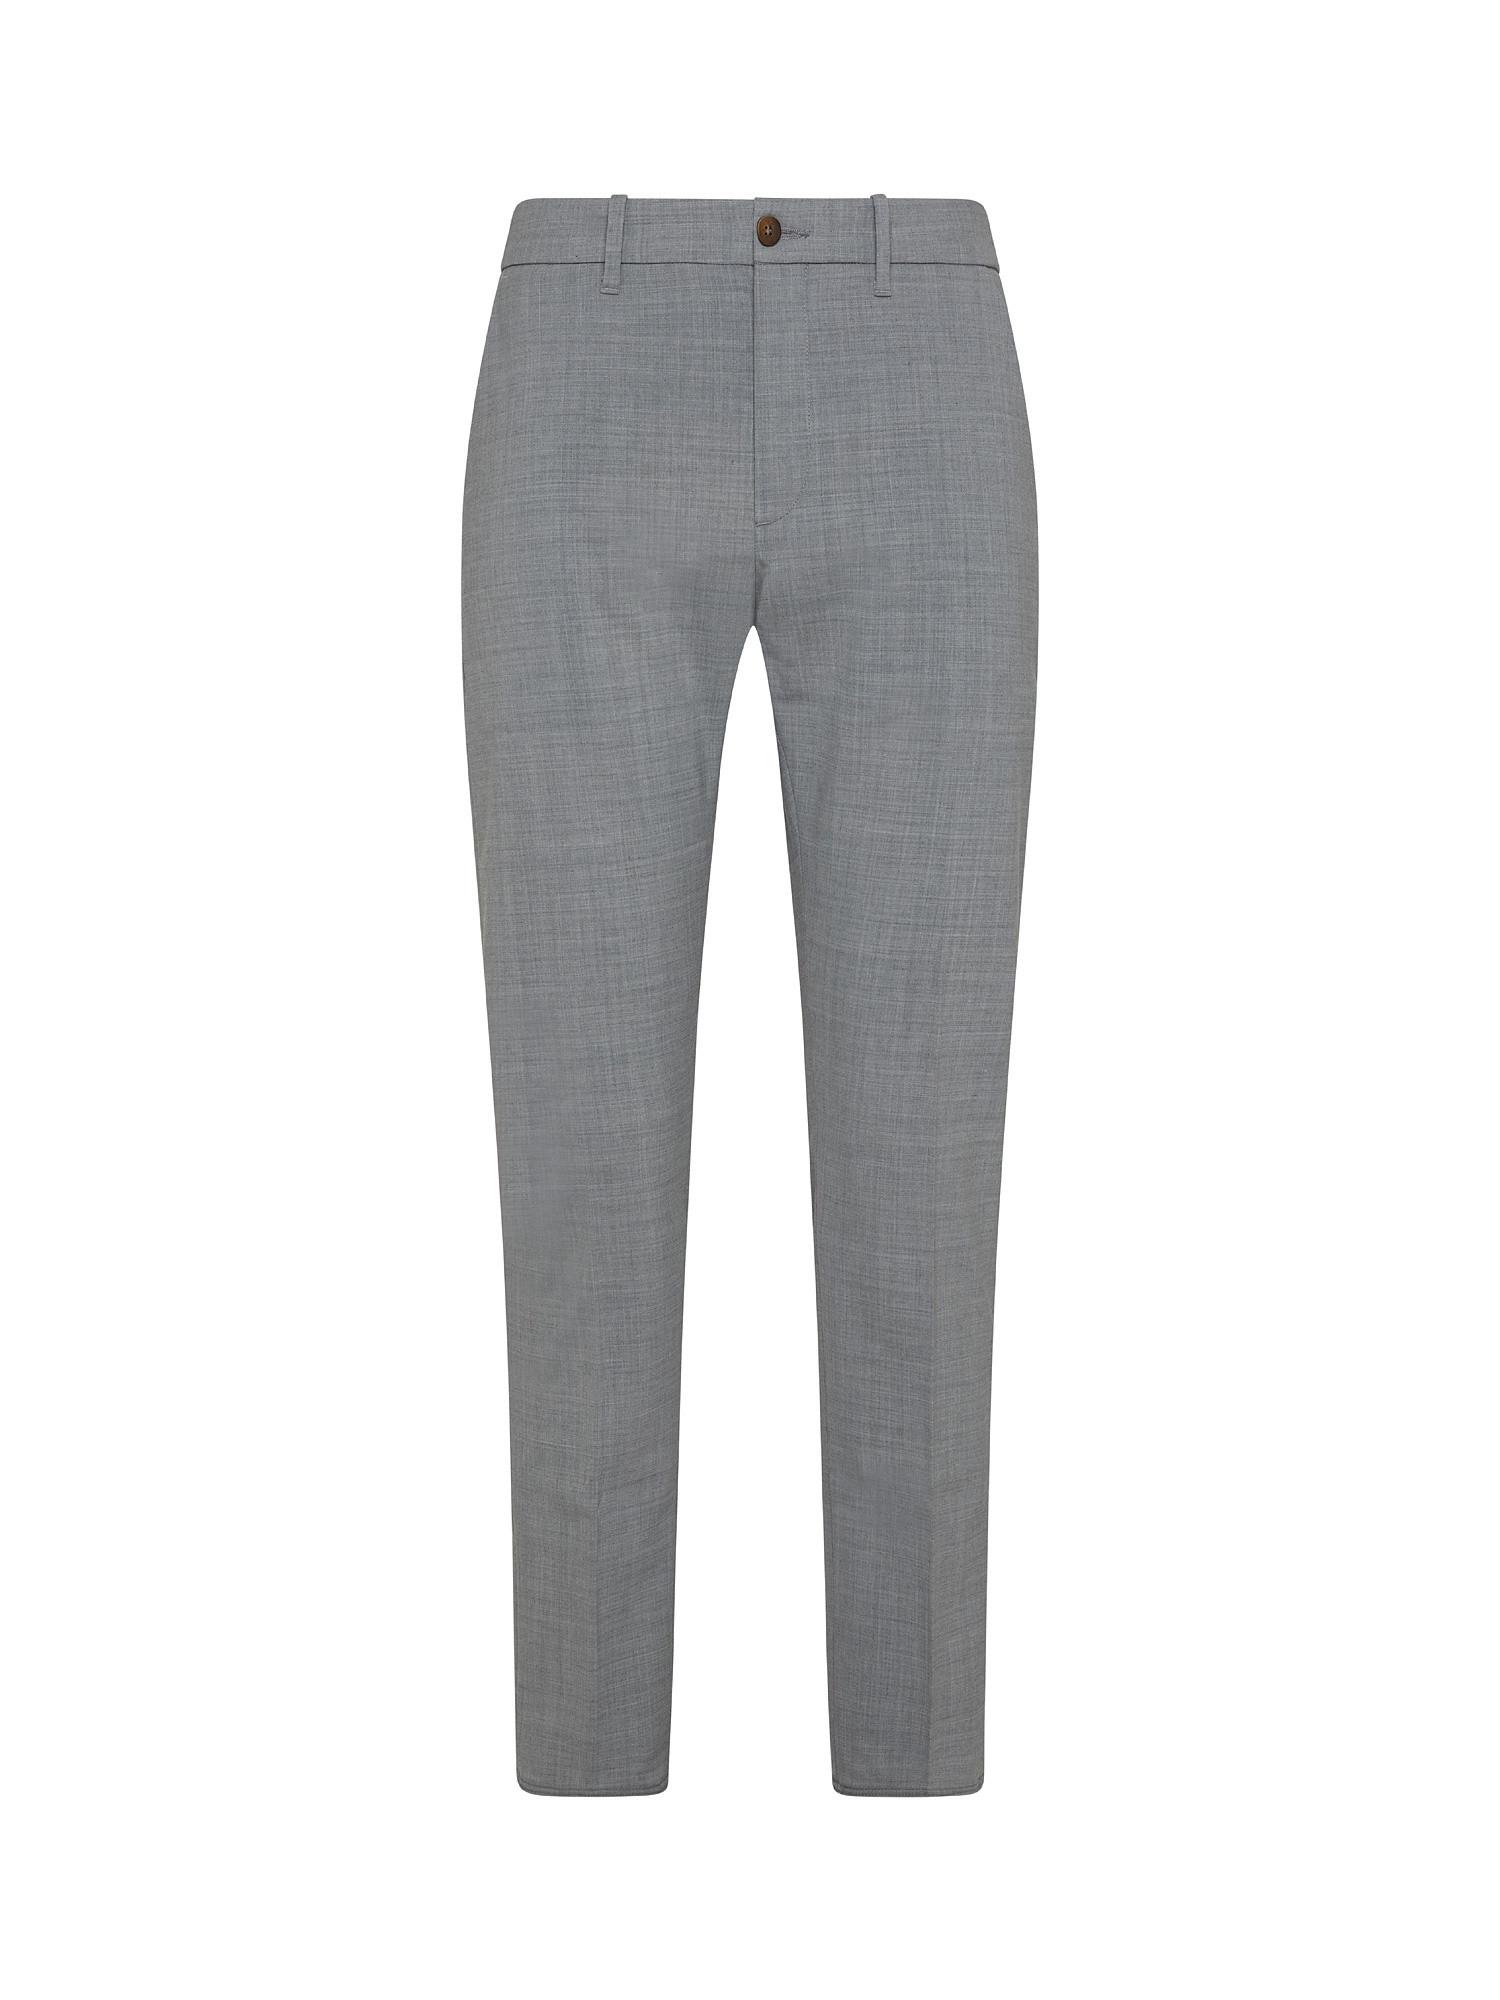 Pantaloni Chino coulisse, Grigio, large image number 0